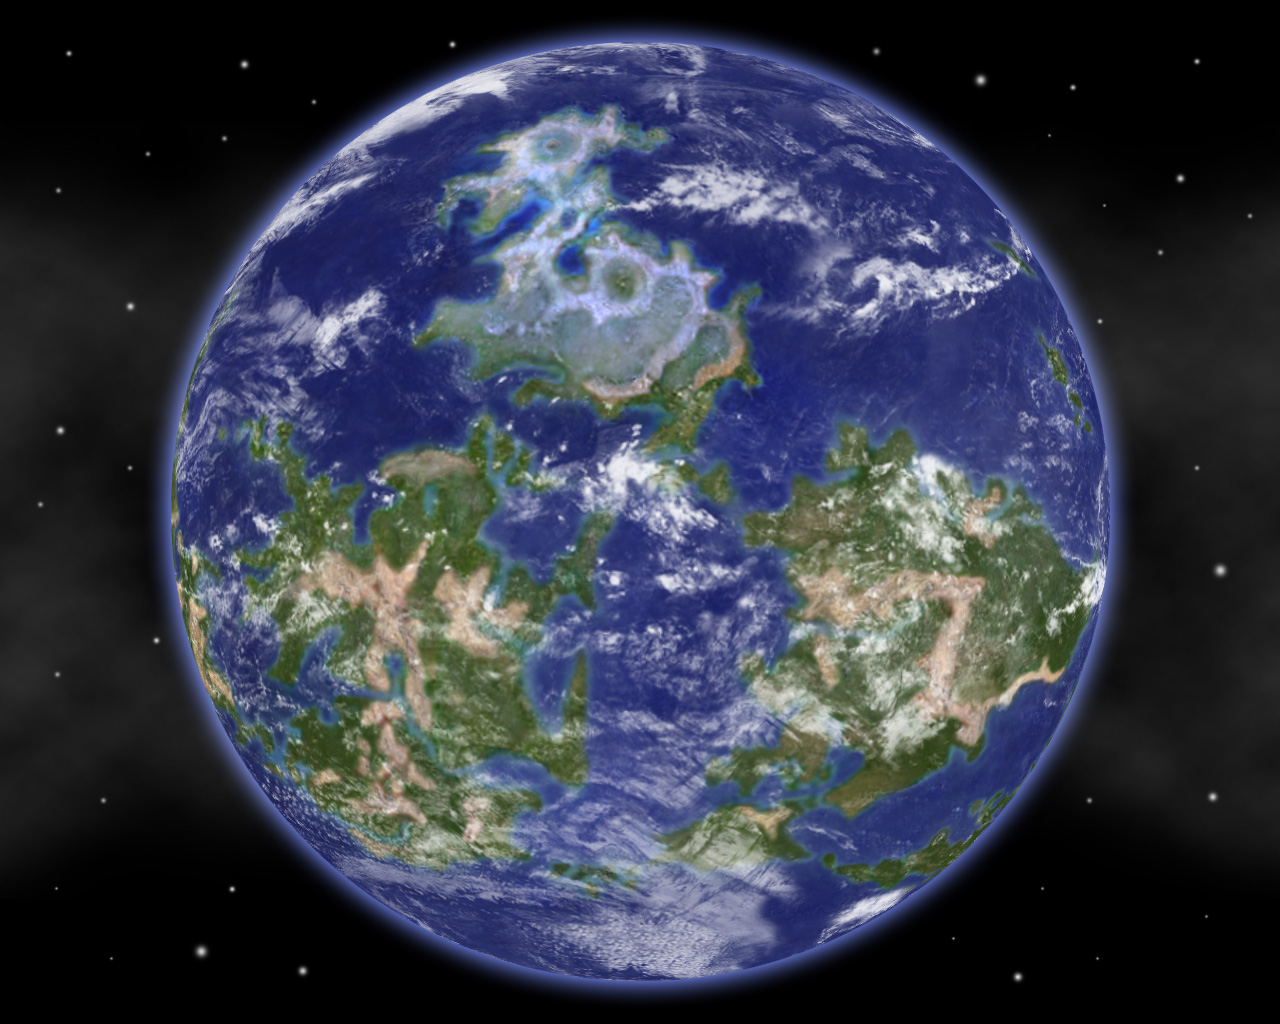 sephirosuy - Life is RPG: Final Fantasy VII world map ...